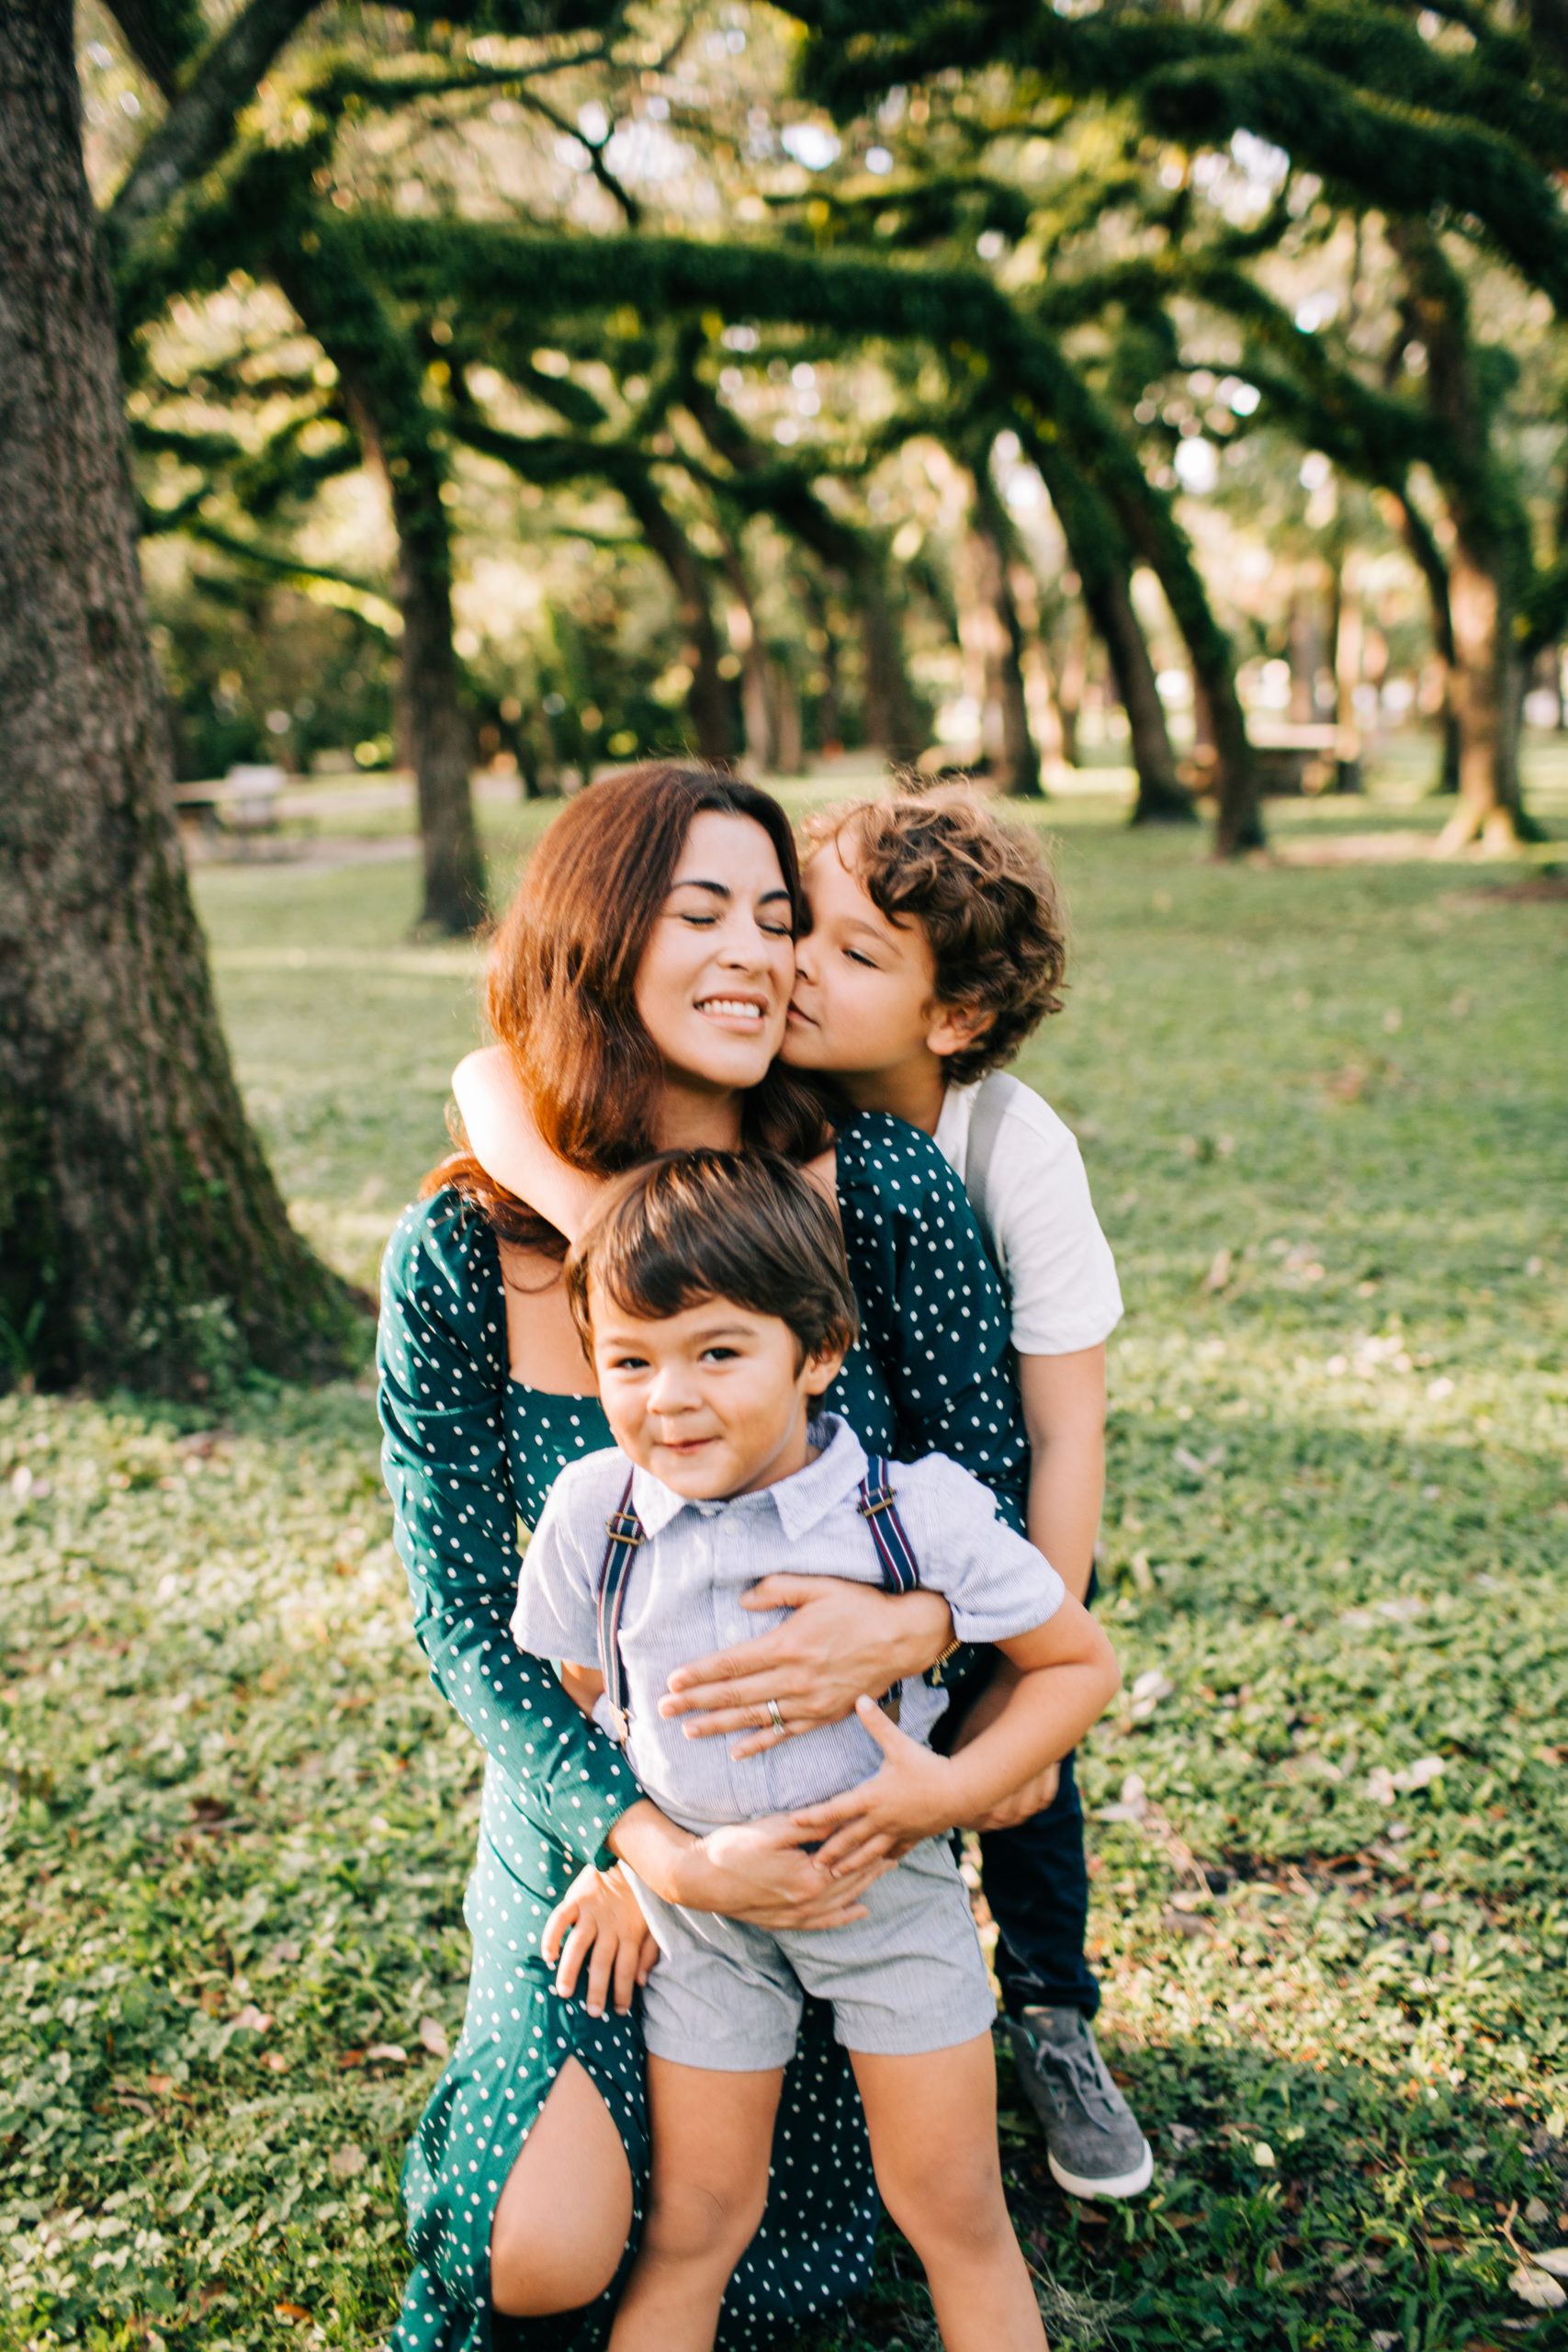 MiamiFamilyPhotoSession-4-scaled Family Photo Session at the Park - Villa Family